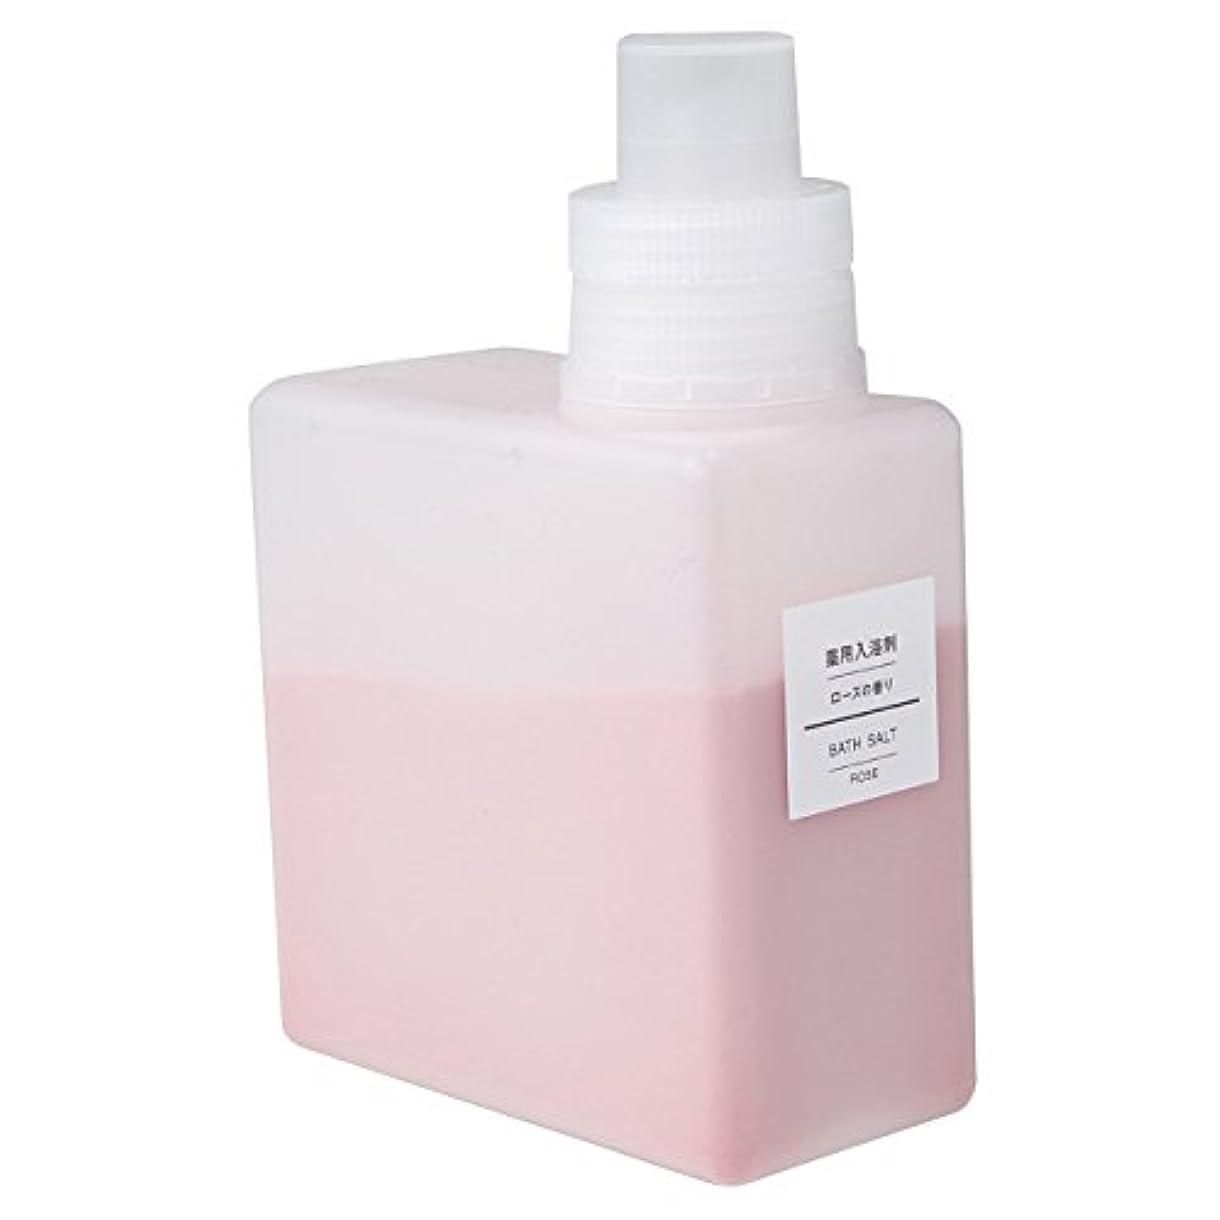 靄不正旅行者無印良品 薬用入浴剤?ローズの香り (新)500g 日本製